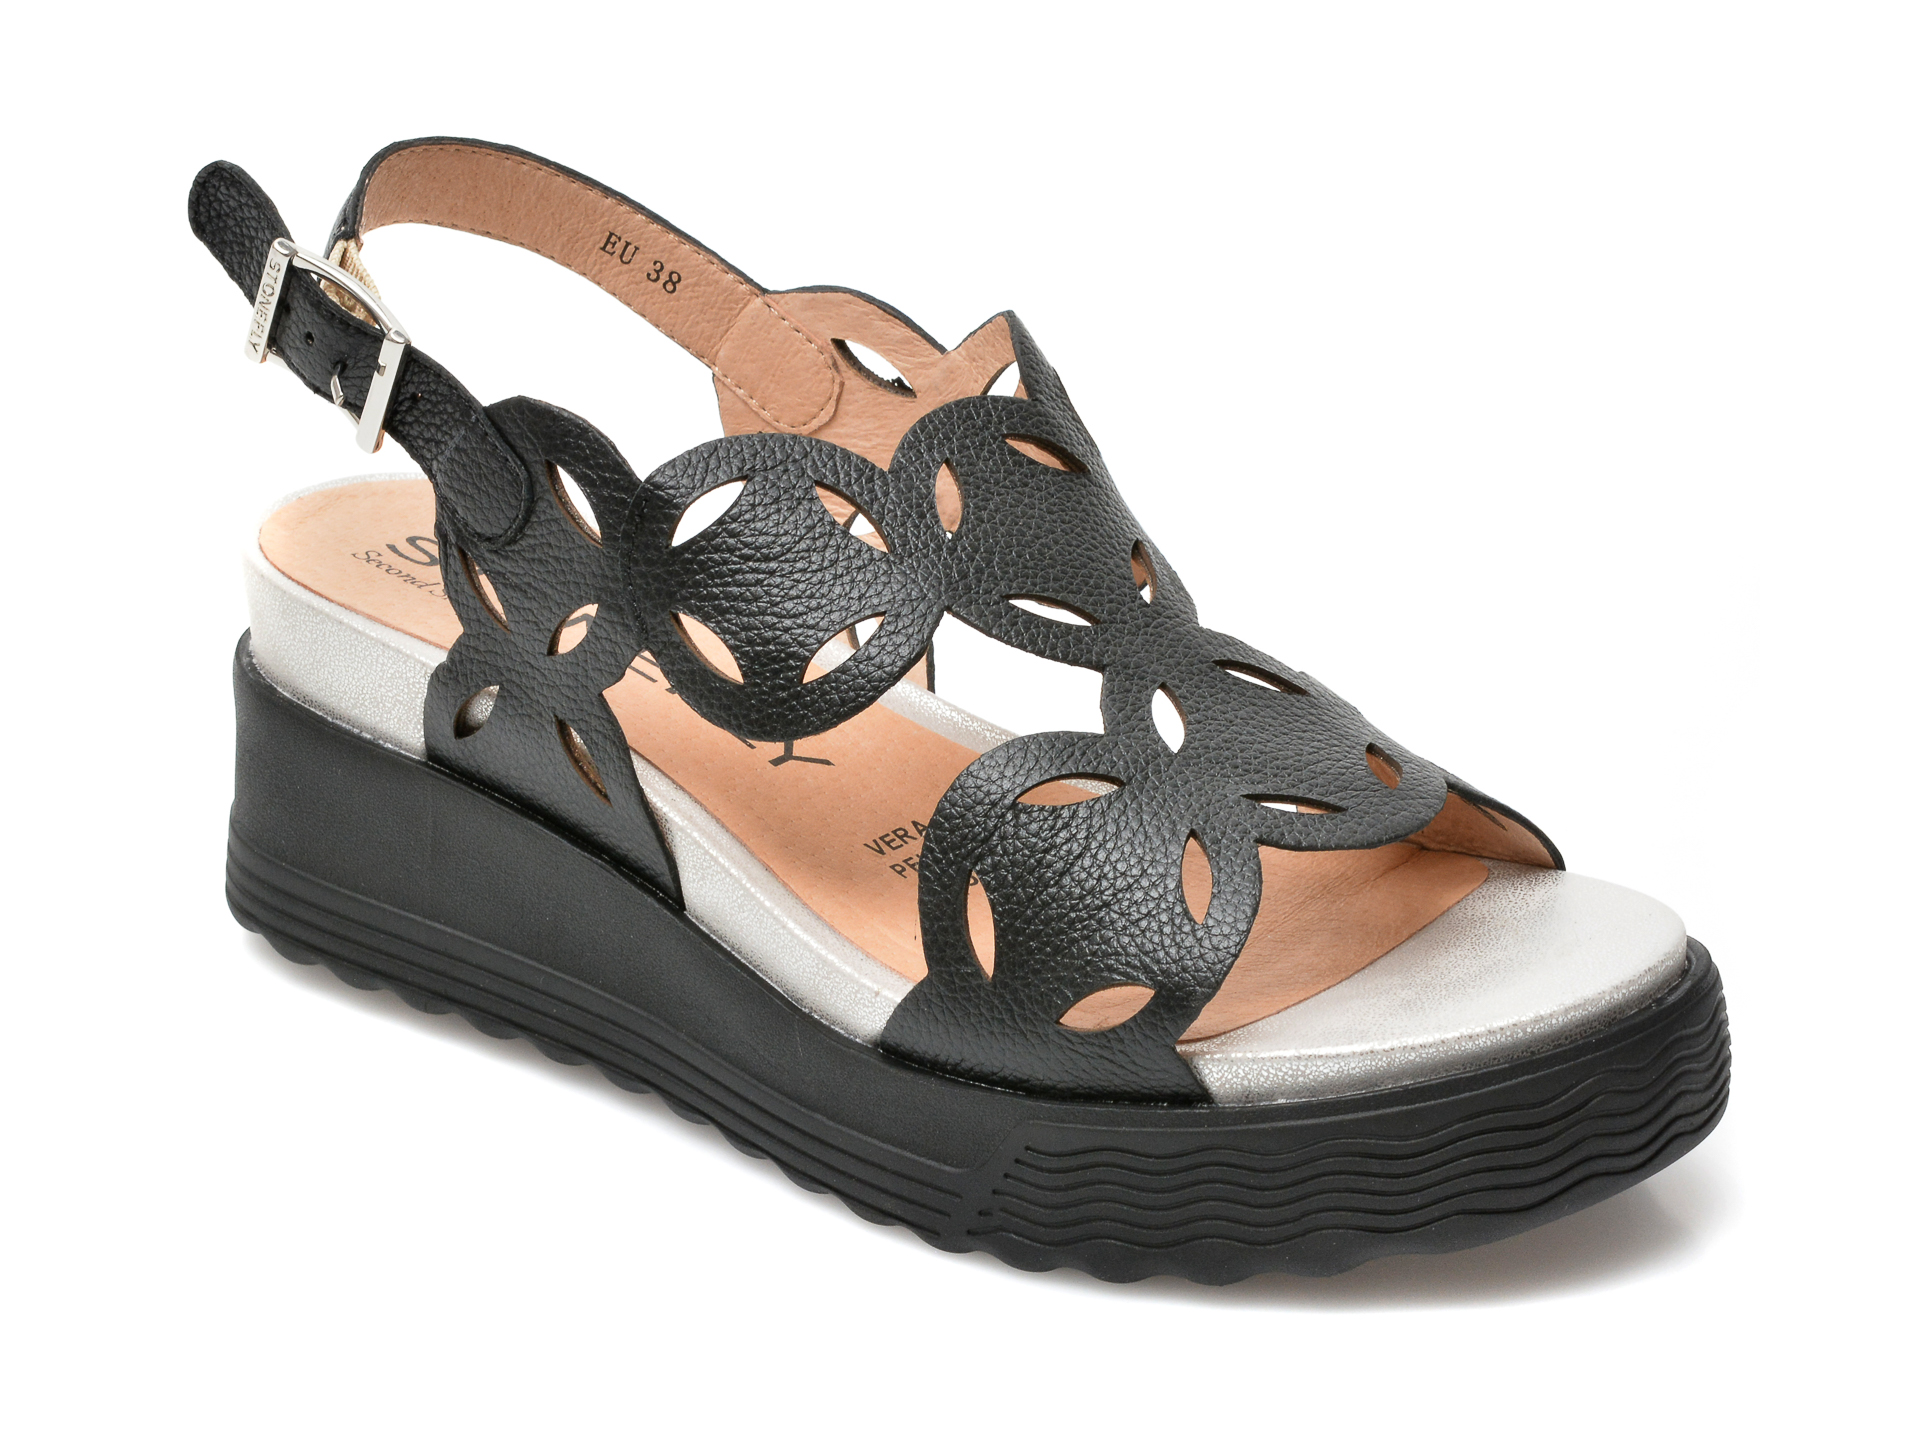 Sandale KAT MACONIE FOR EPICA roz, FRIDA, din piele naturala